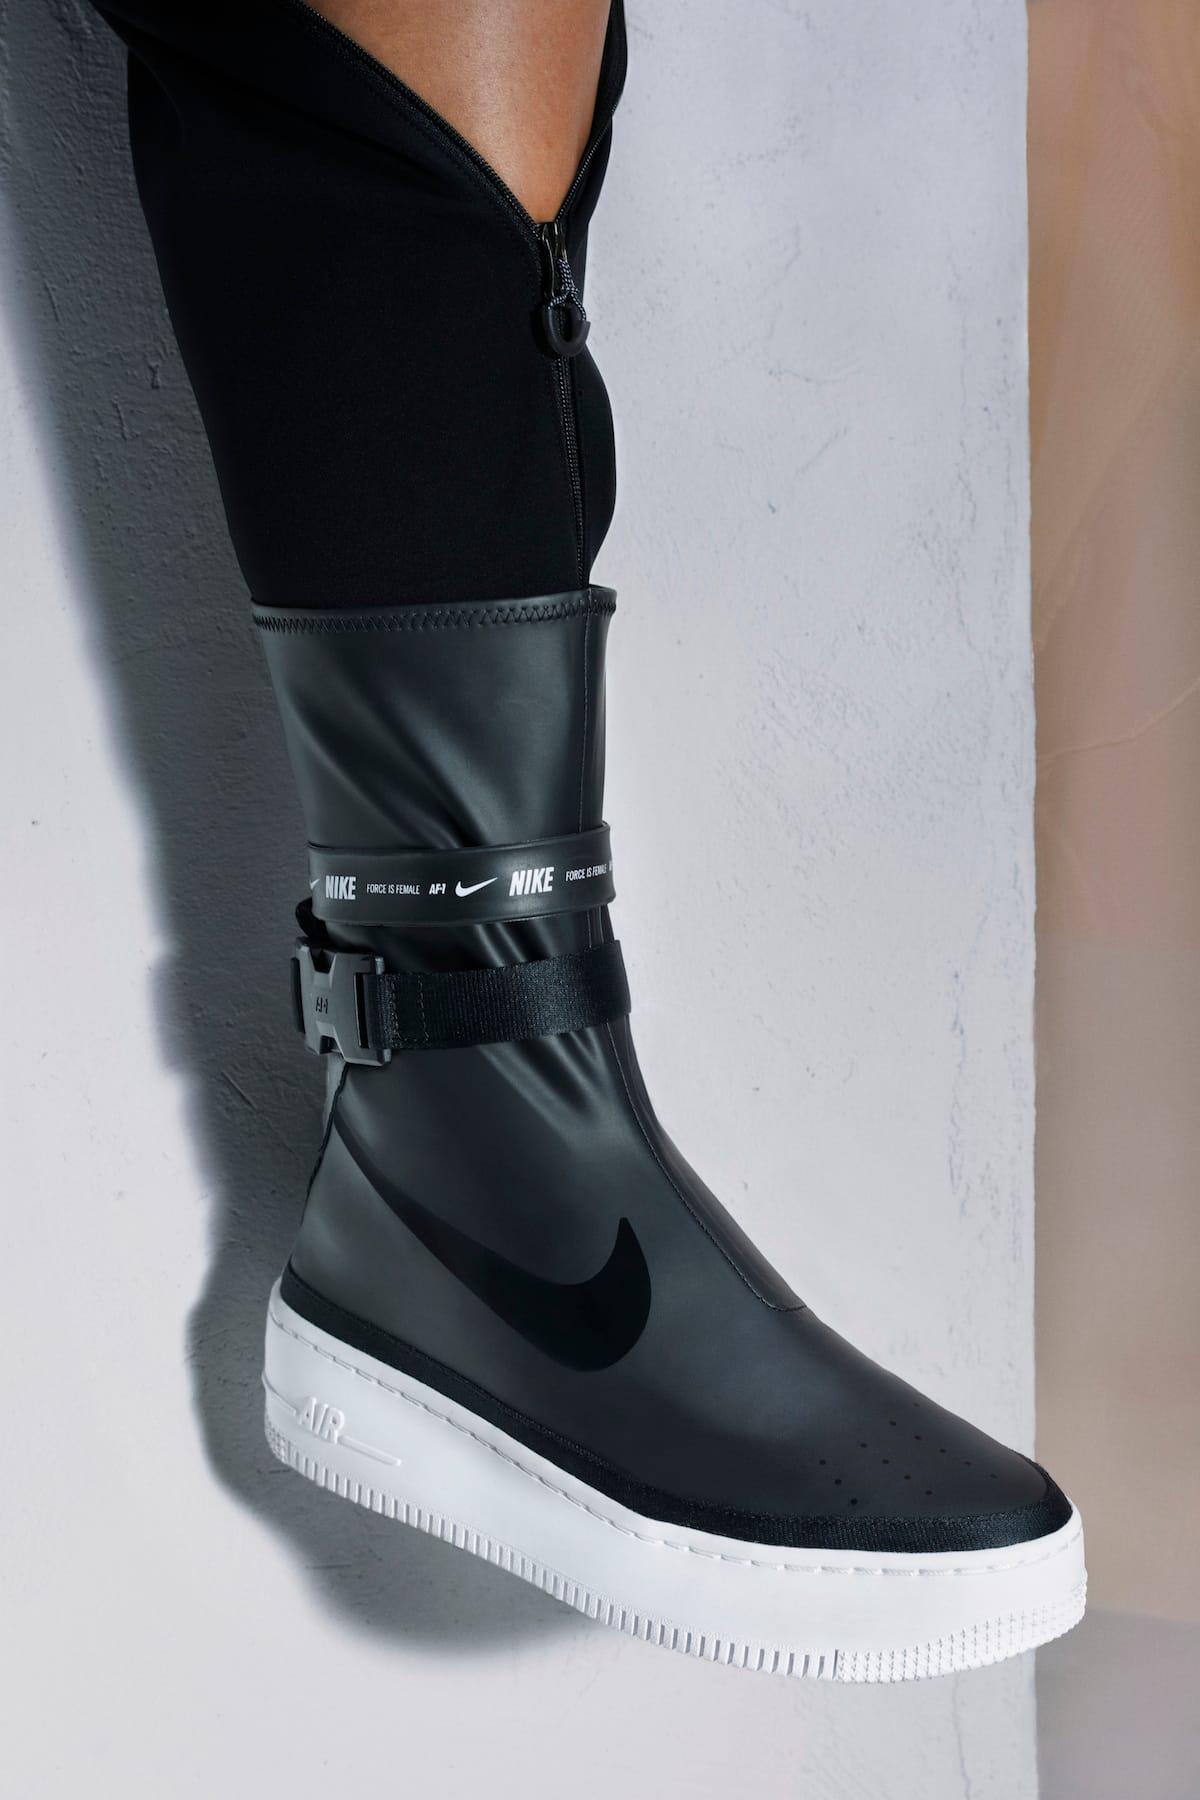 nike air force 1 womens boot